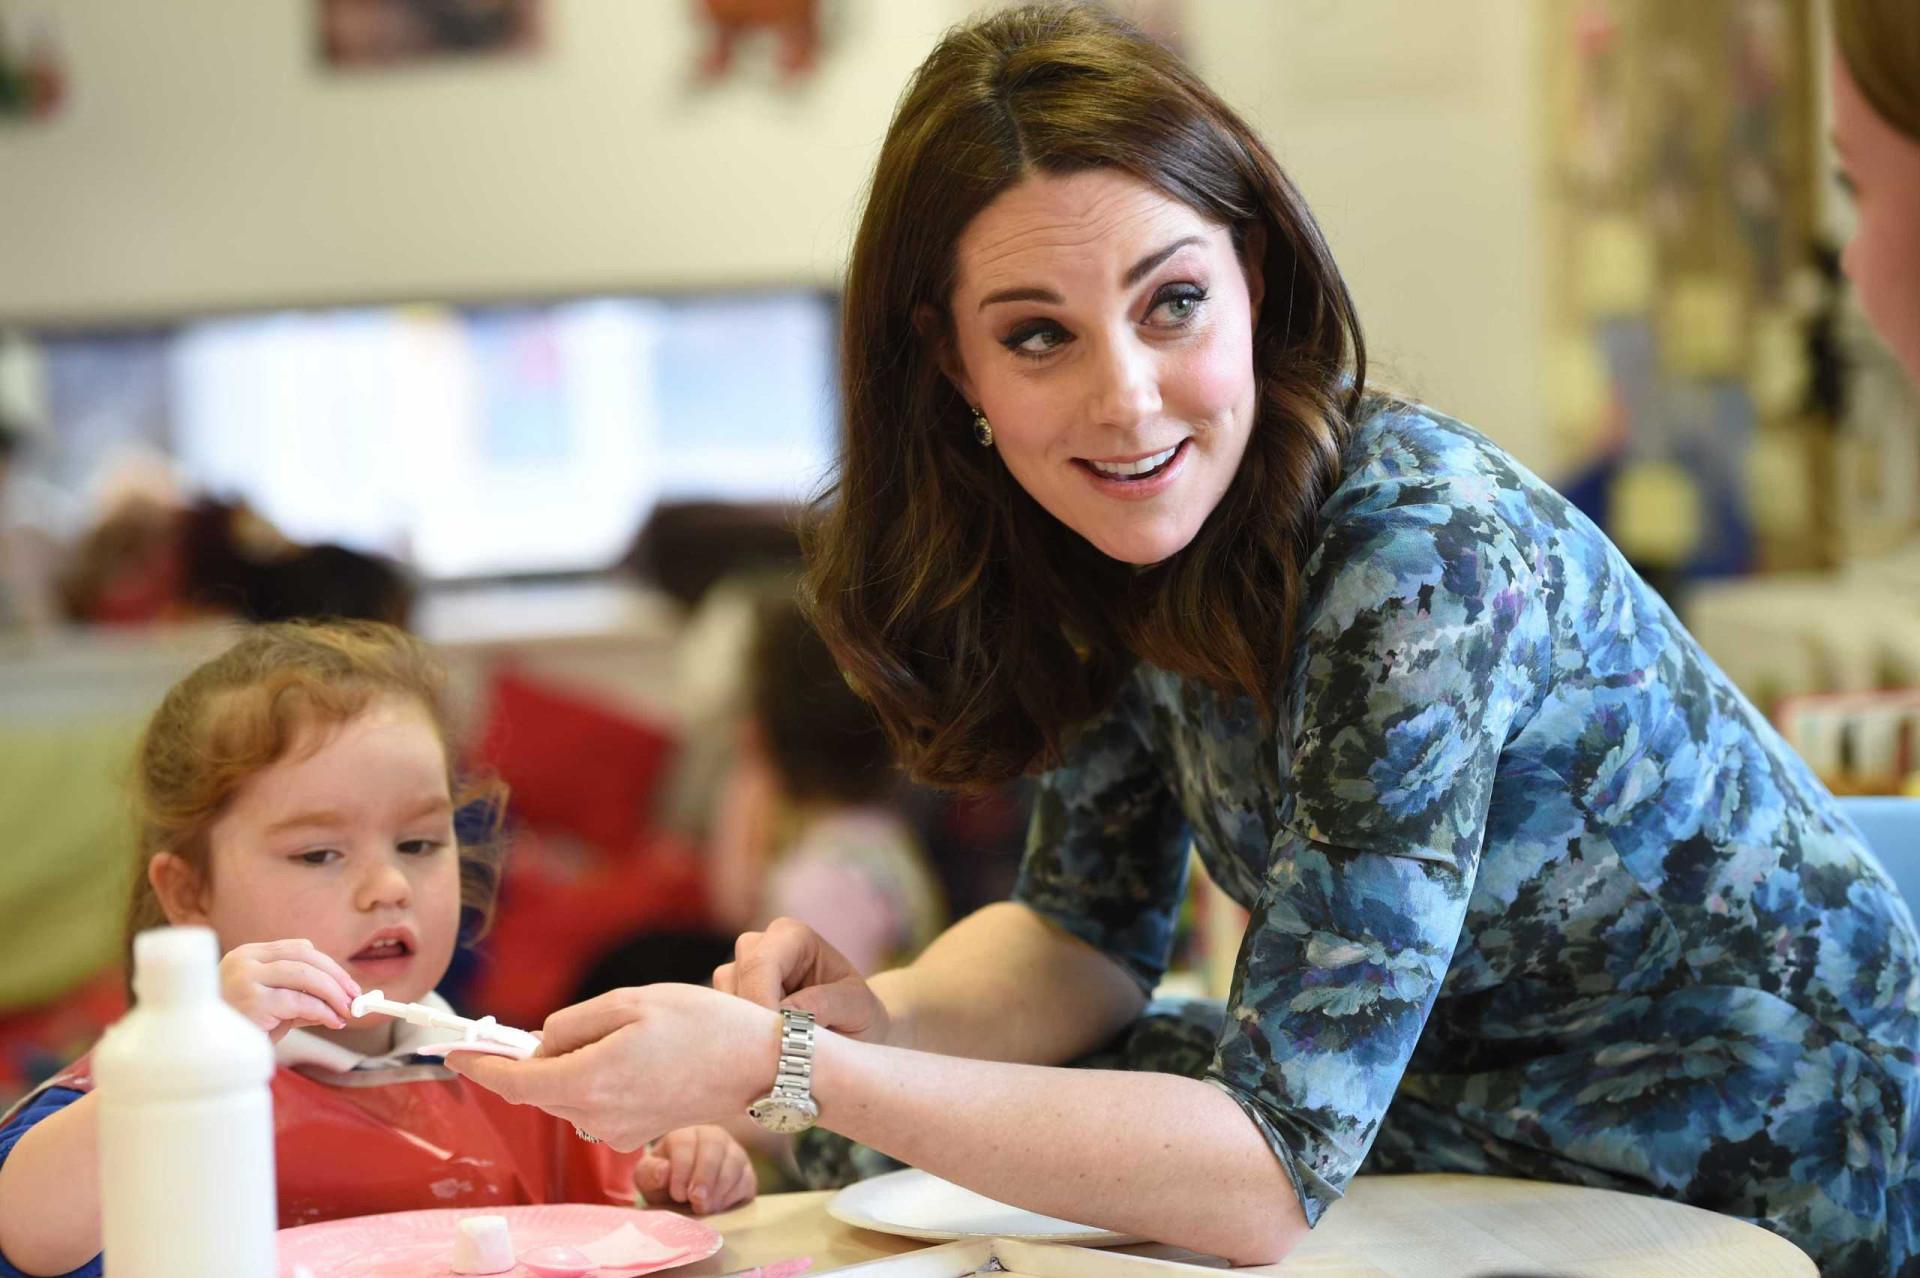 Aos sete meses de gravidez, Kate Middleton surpreende pela elegância